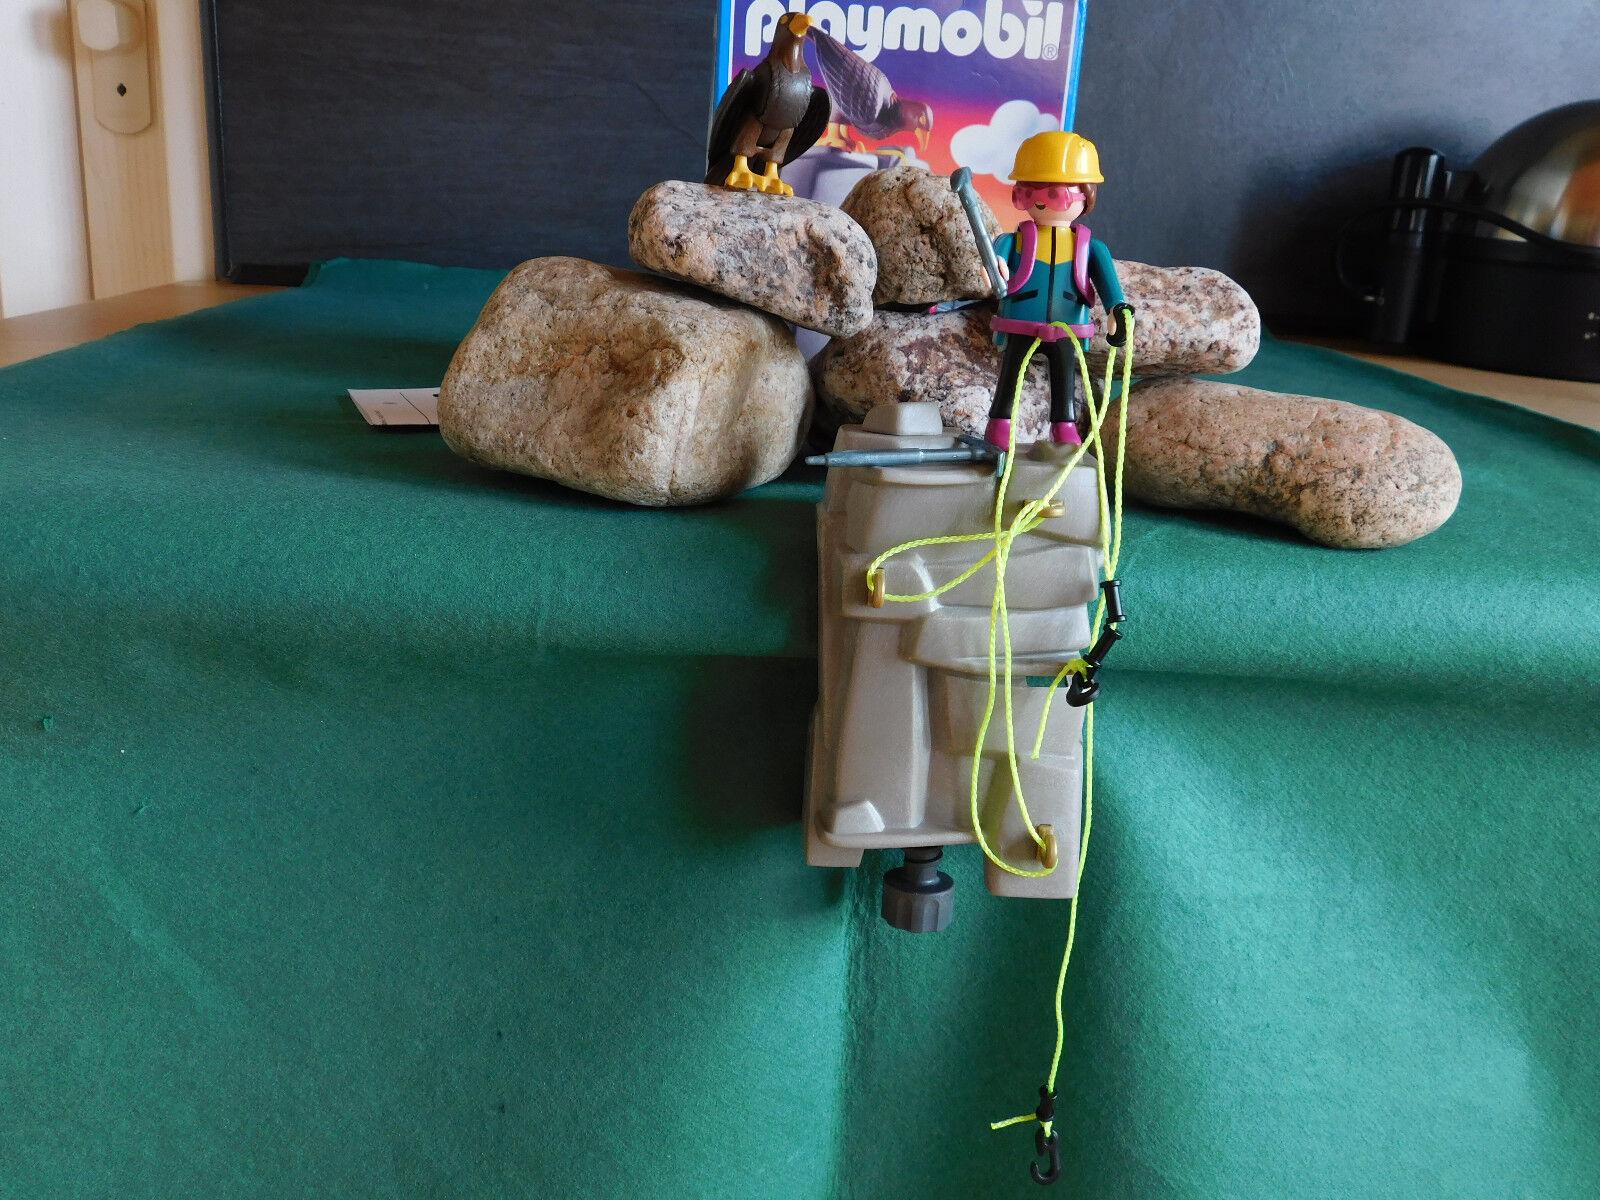 Playmobil Rarität Bergsteiger 3842-A 1996 Komplett-Set mit BA und OVP